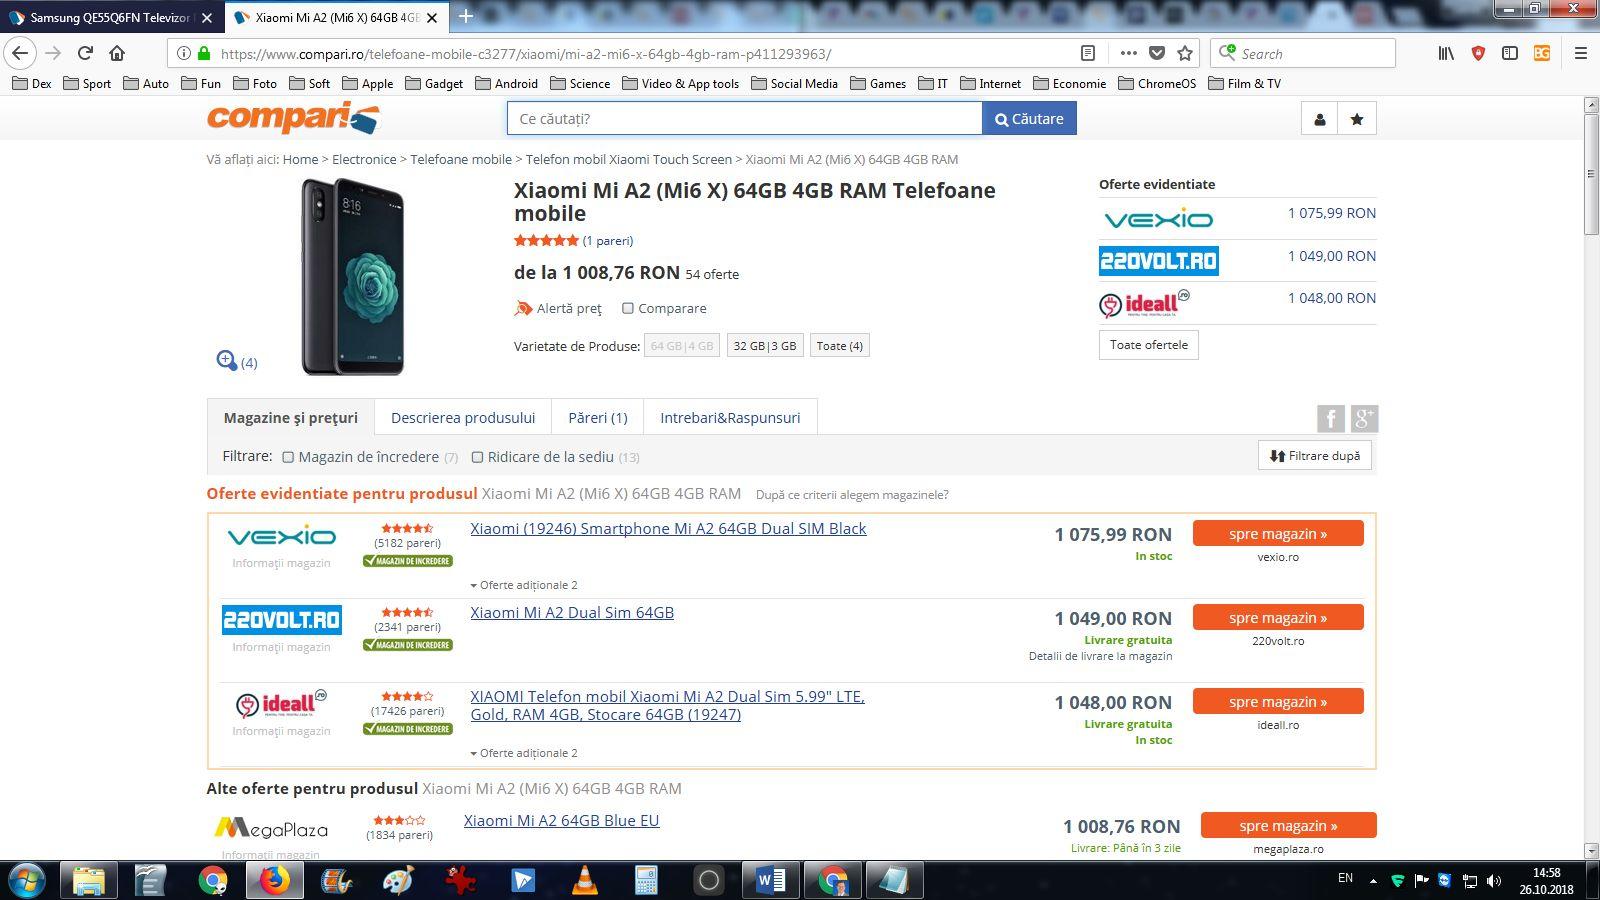 Xiaomi Mi Aa2 pe Compari.ro